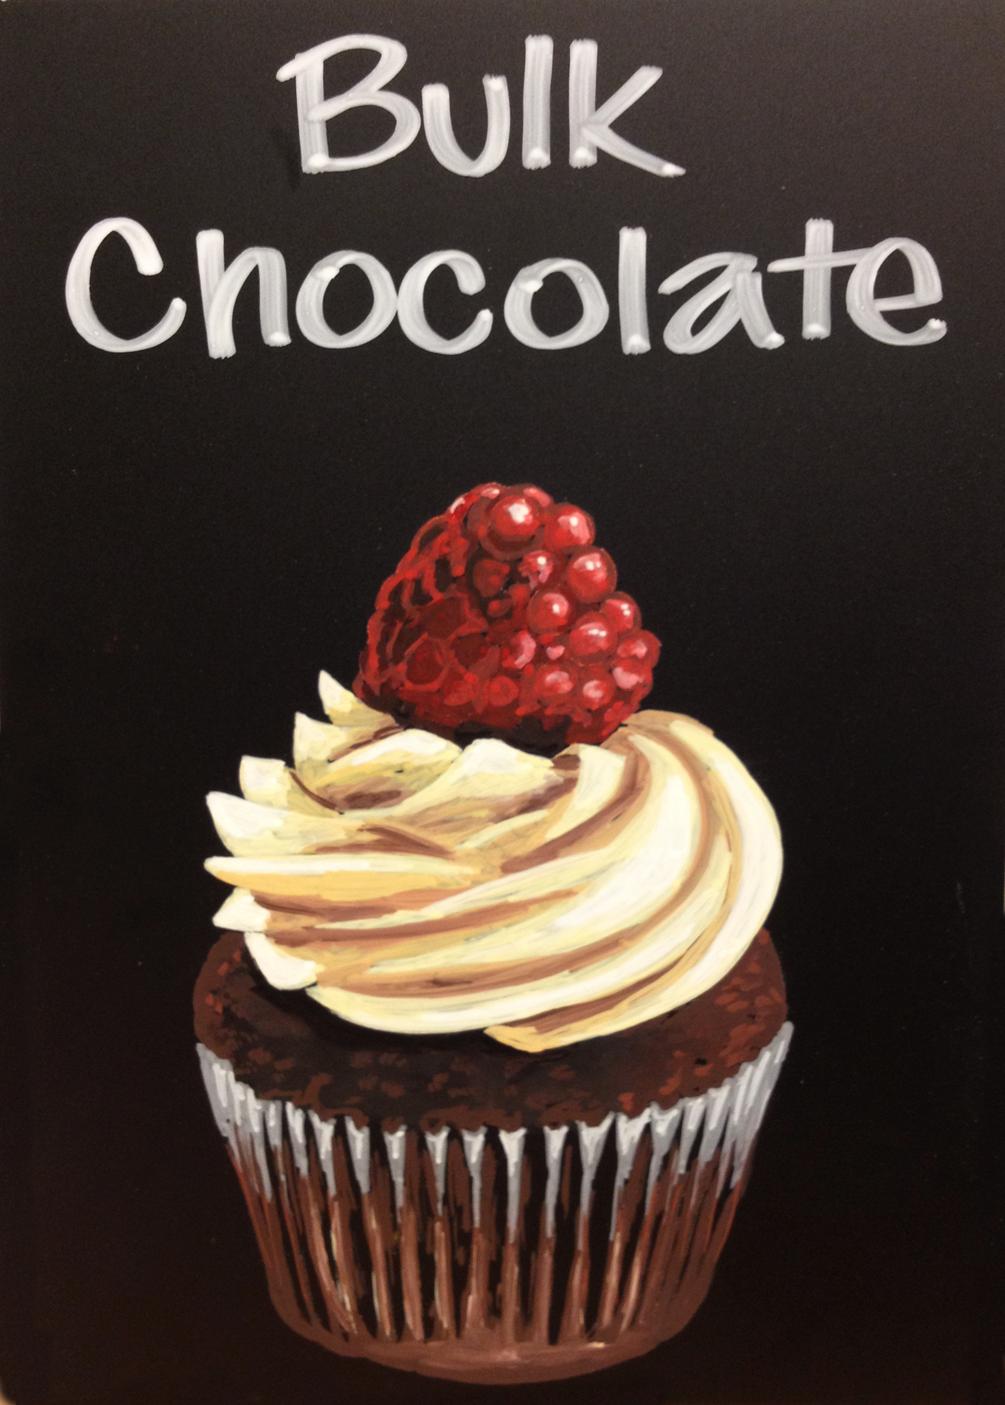 BulkChocolateCupcake.png